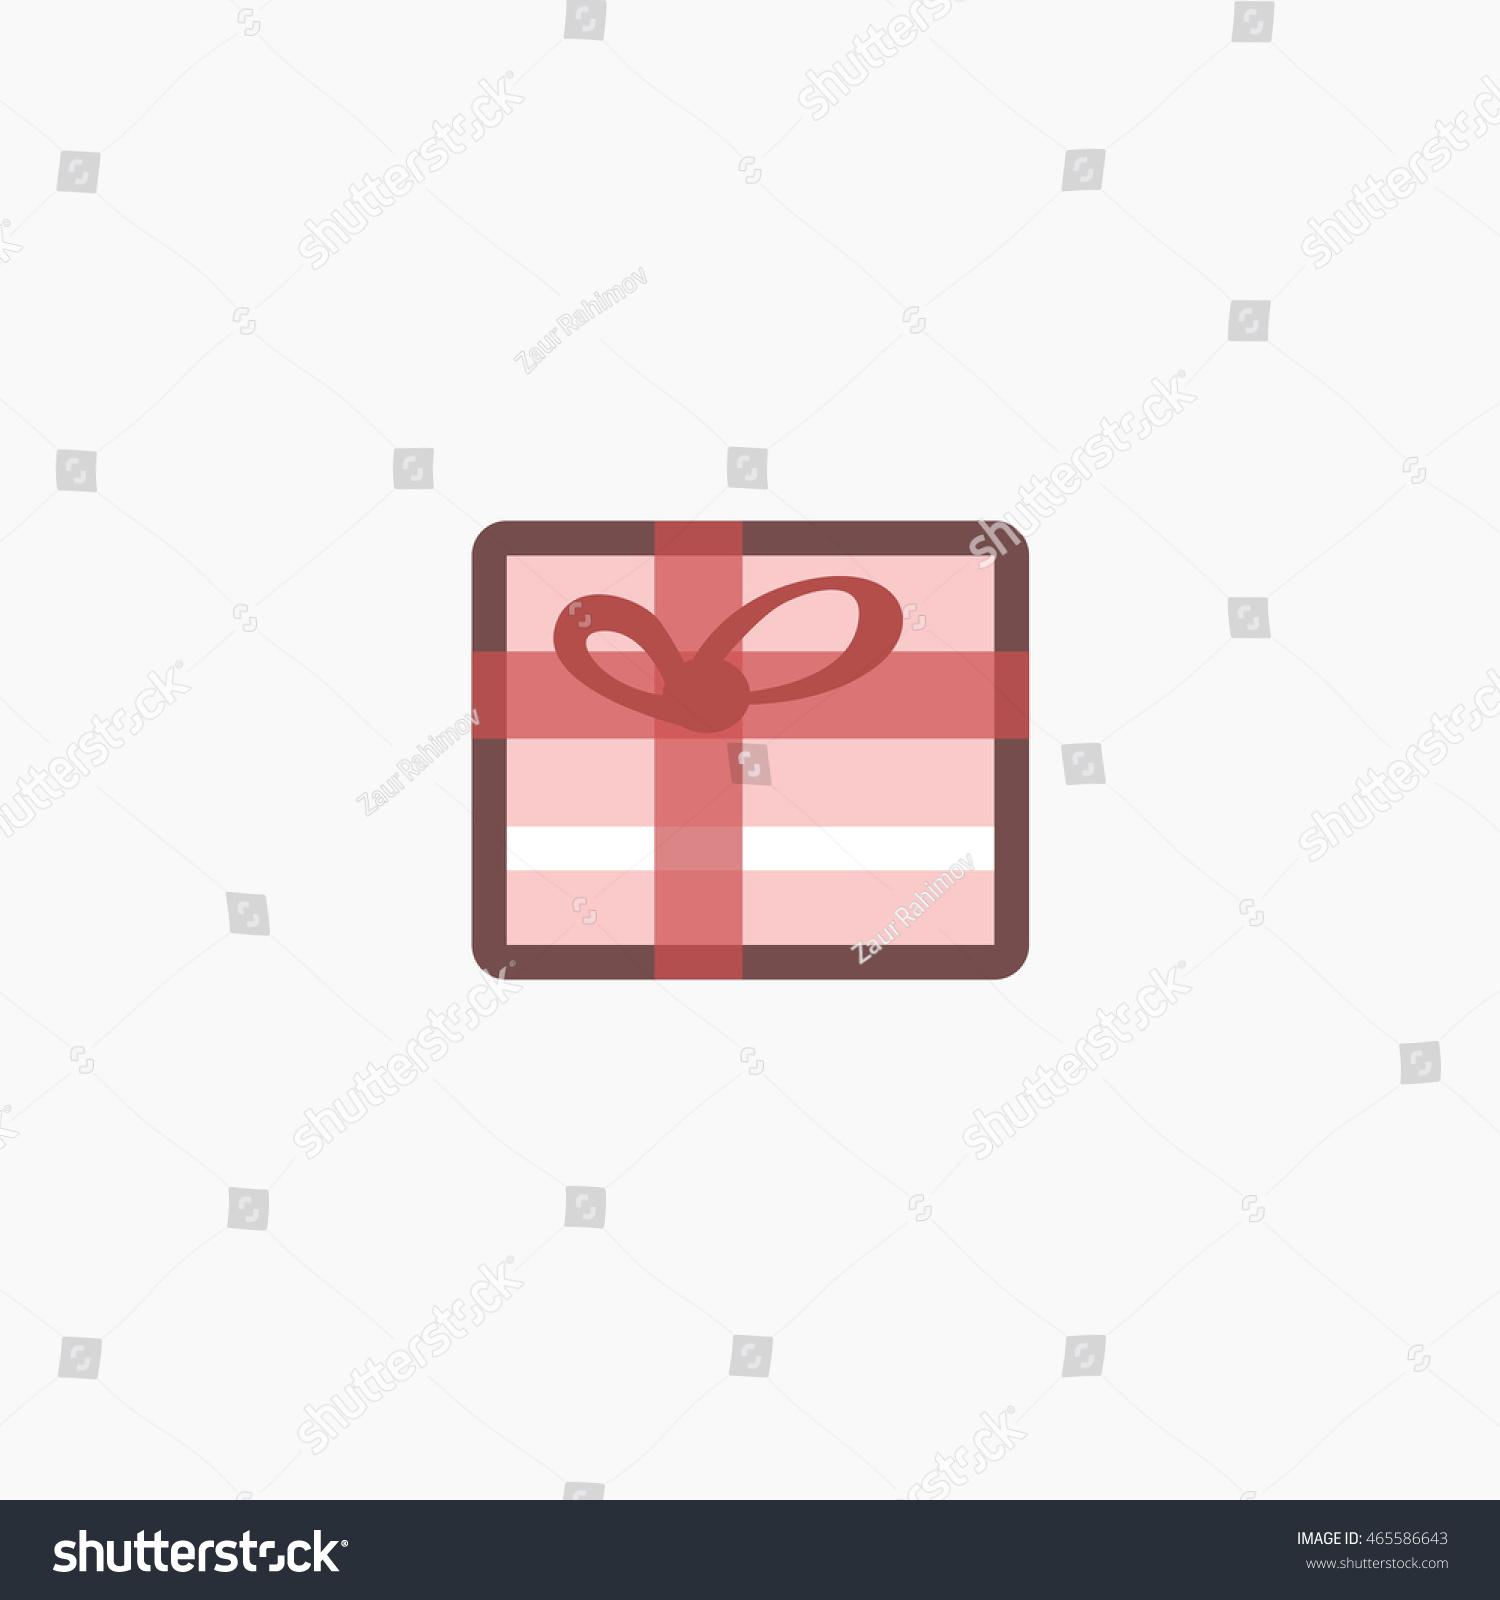 Facebook Gift Icon Vector Present Graphic Stock Vector 465586643